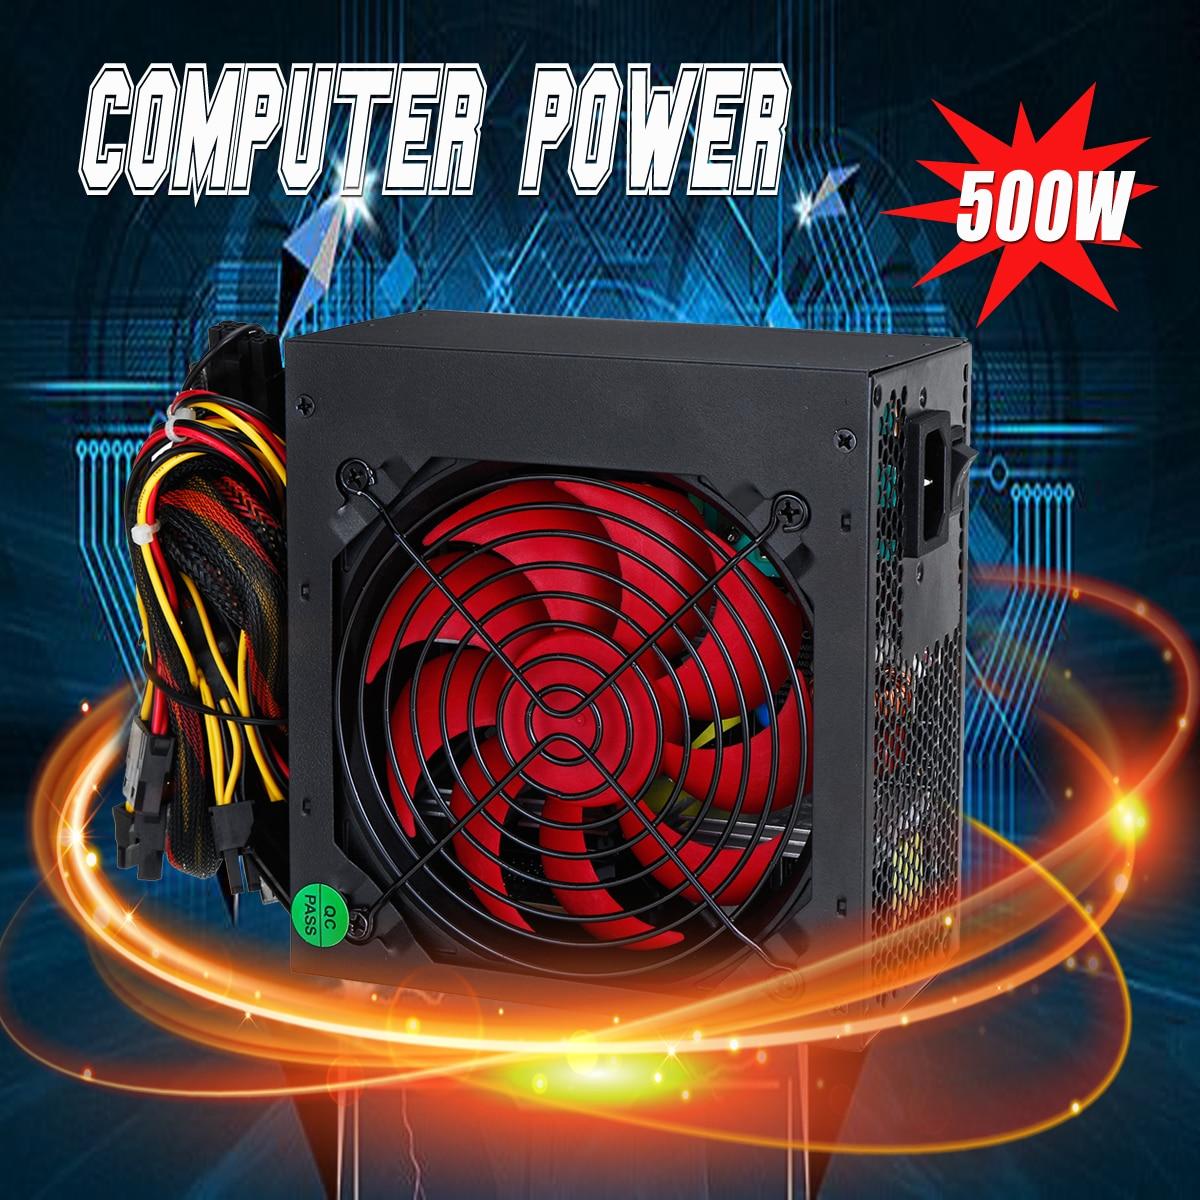 цена на 110-240v 500W PFC Power Supply Active ATX Computer Power Supply 5XSATA 5XIDE 1X6+2P 1X4+4P Fan Computer Power Supply For BTC